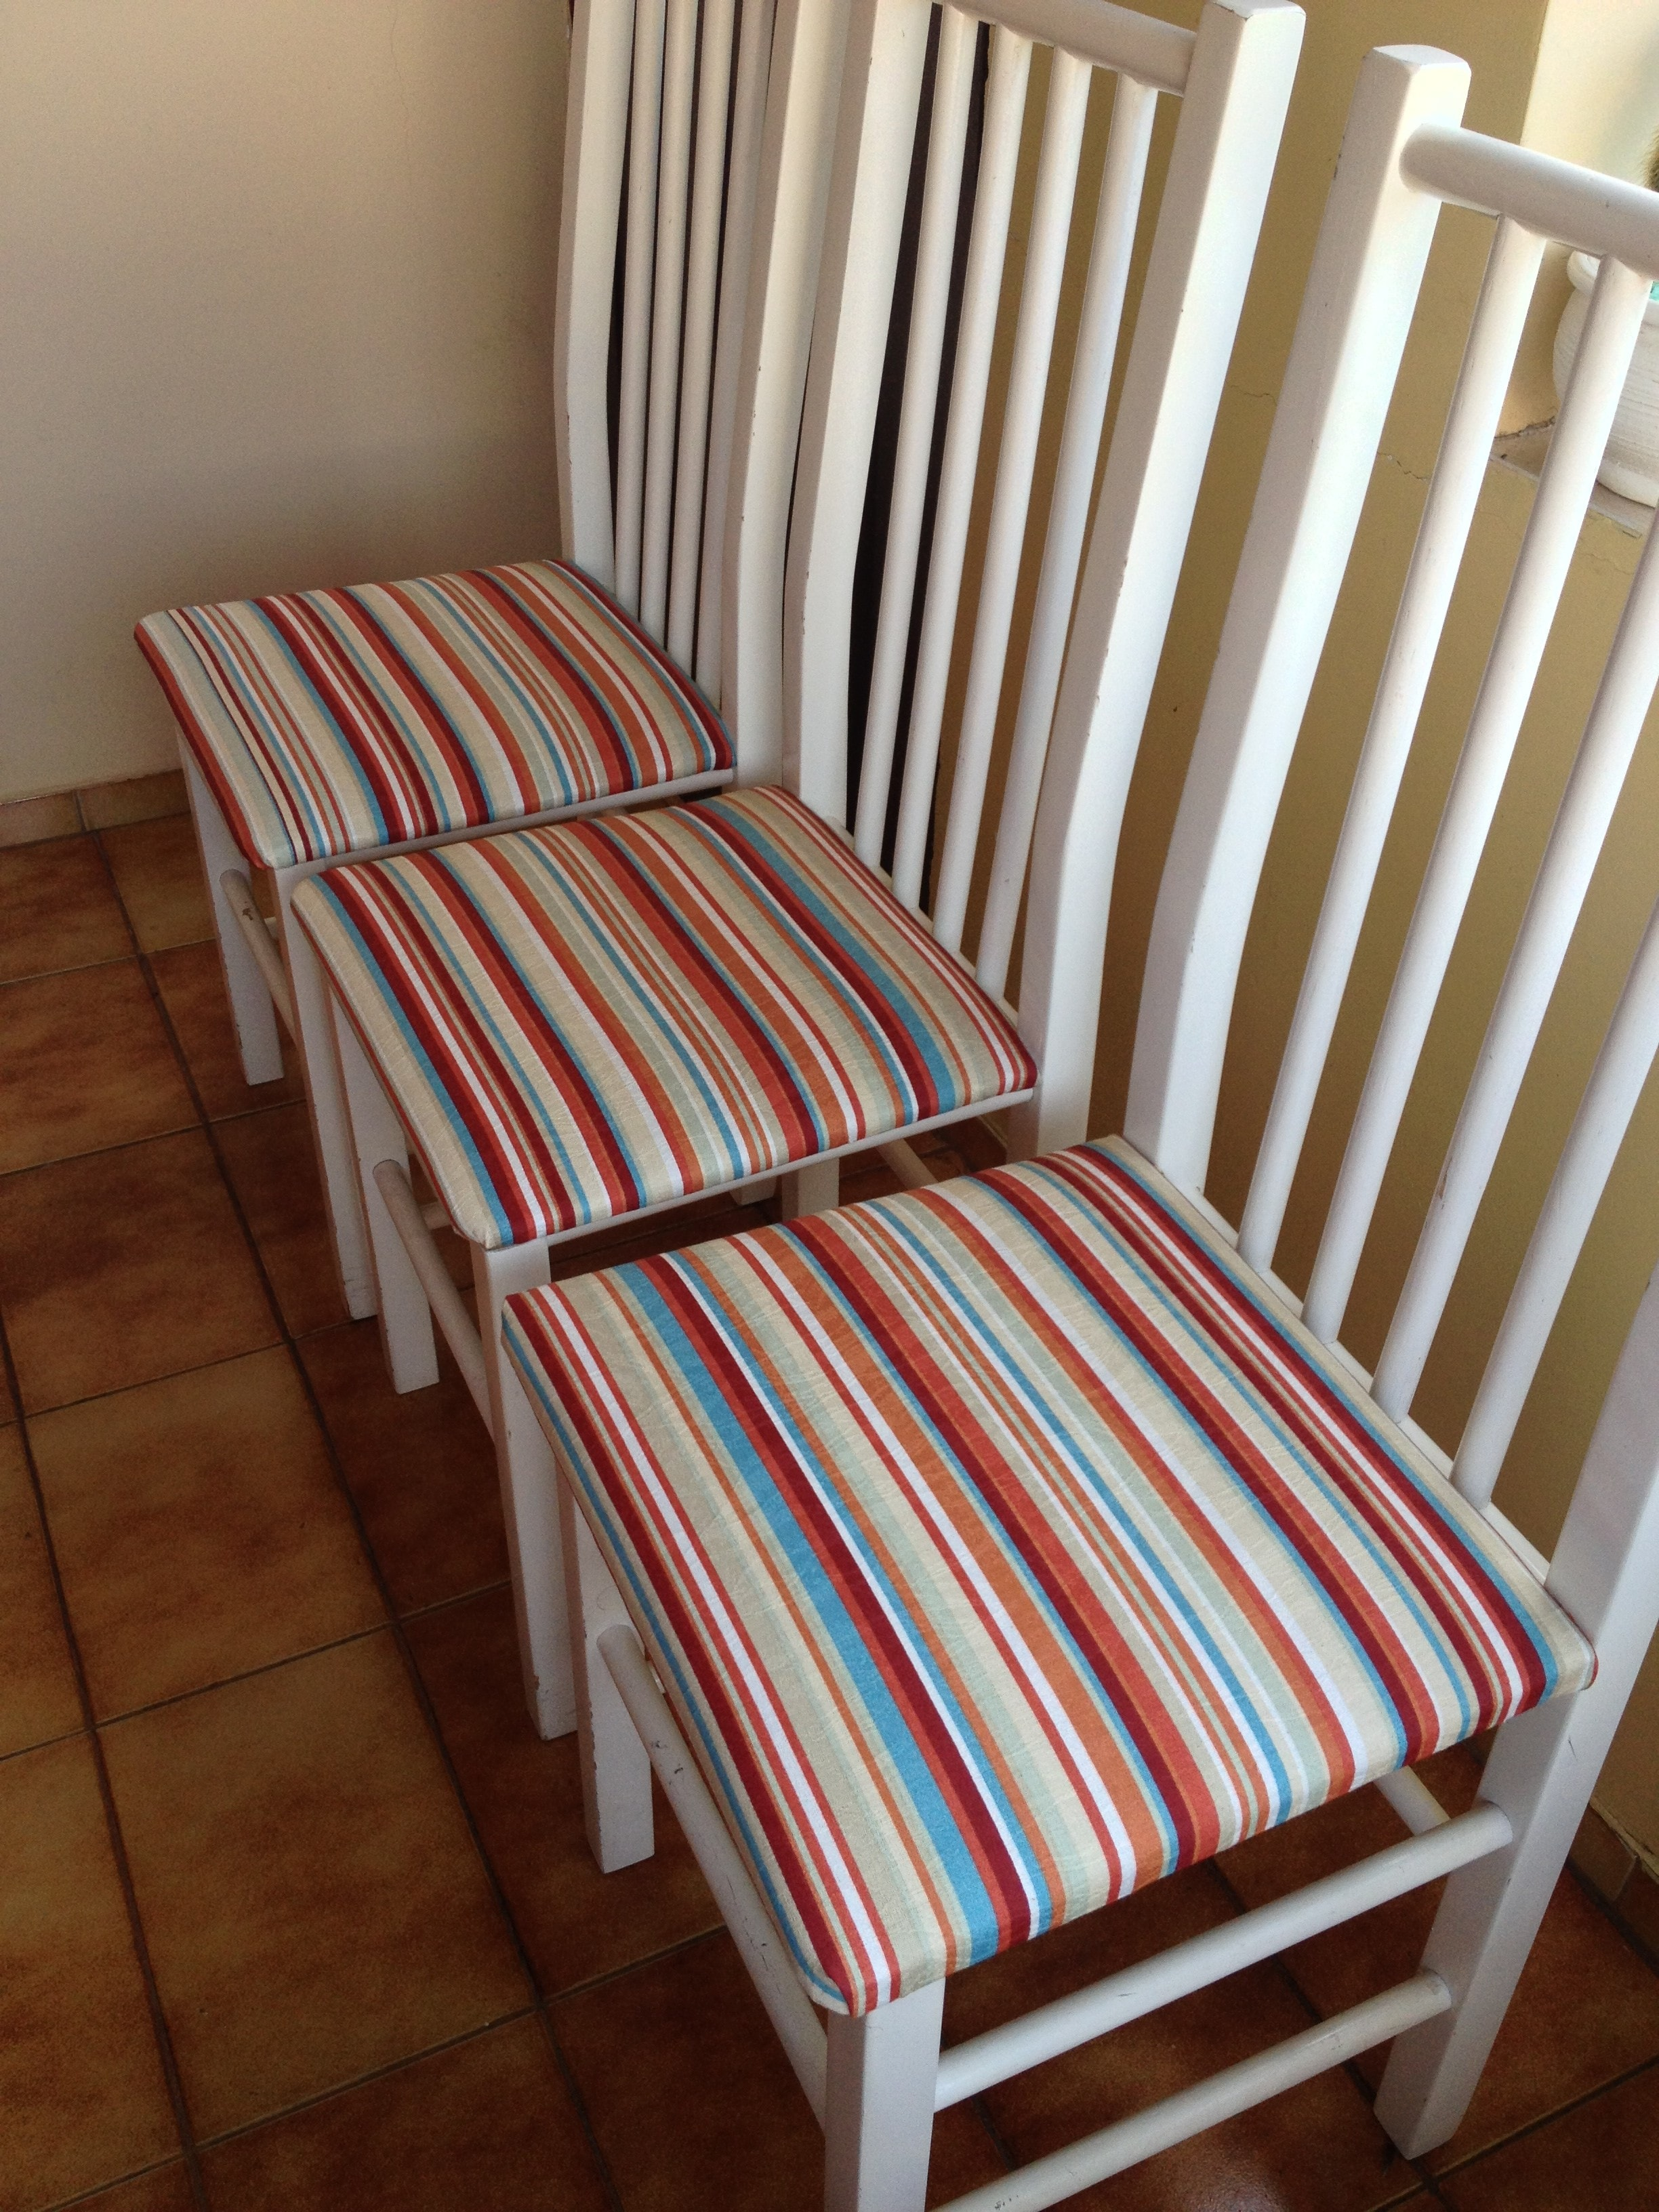 Upgrade_na_cadeira_da_tia_sos_solteiros_passo_5